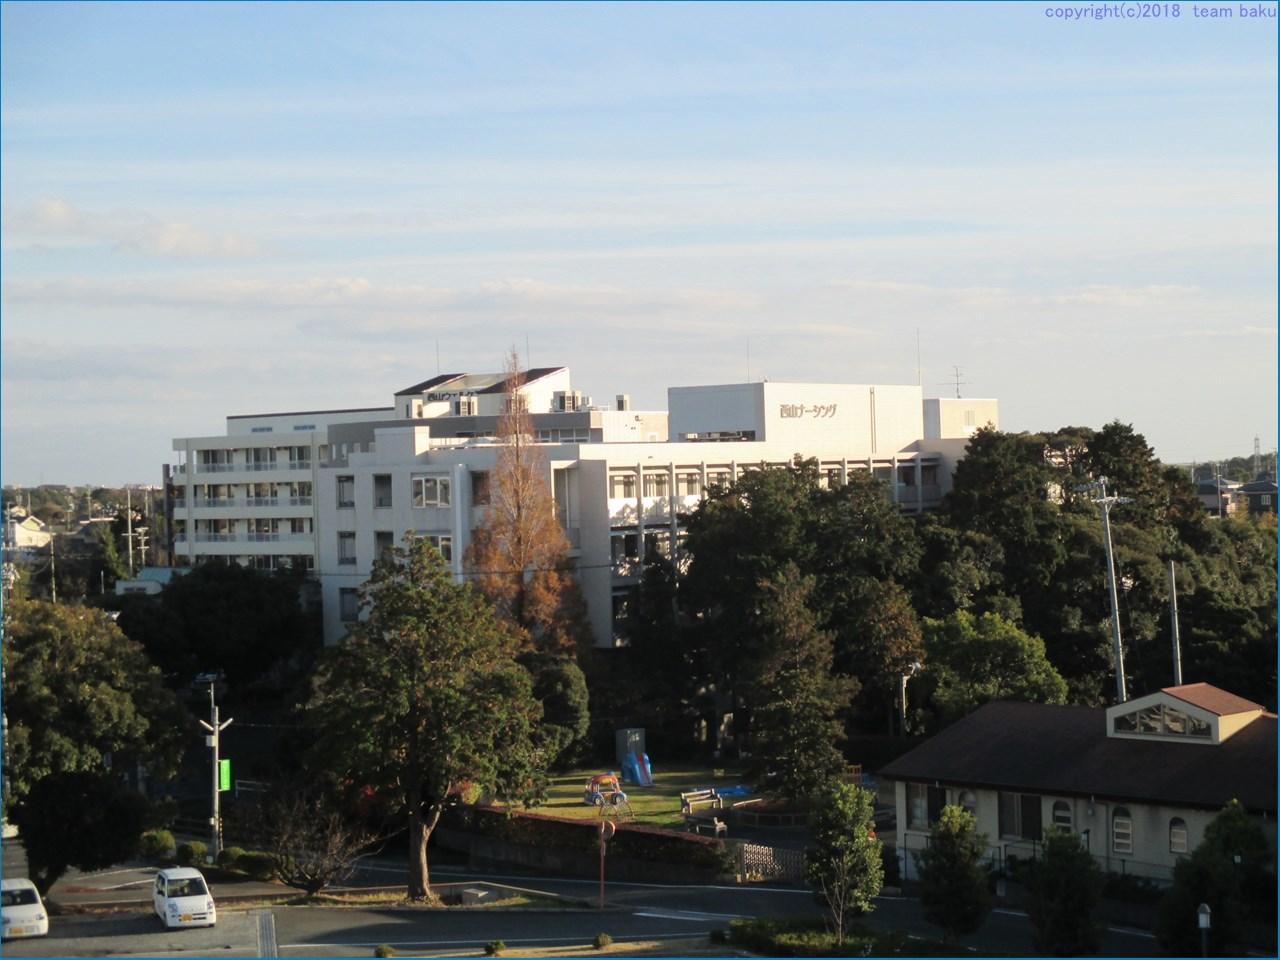 N病院グループ 特定建築物の定期報告調査2_c0376508_20431978.jpg